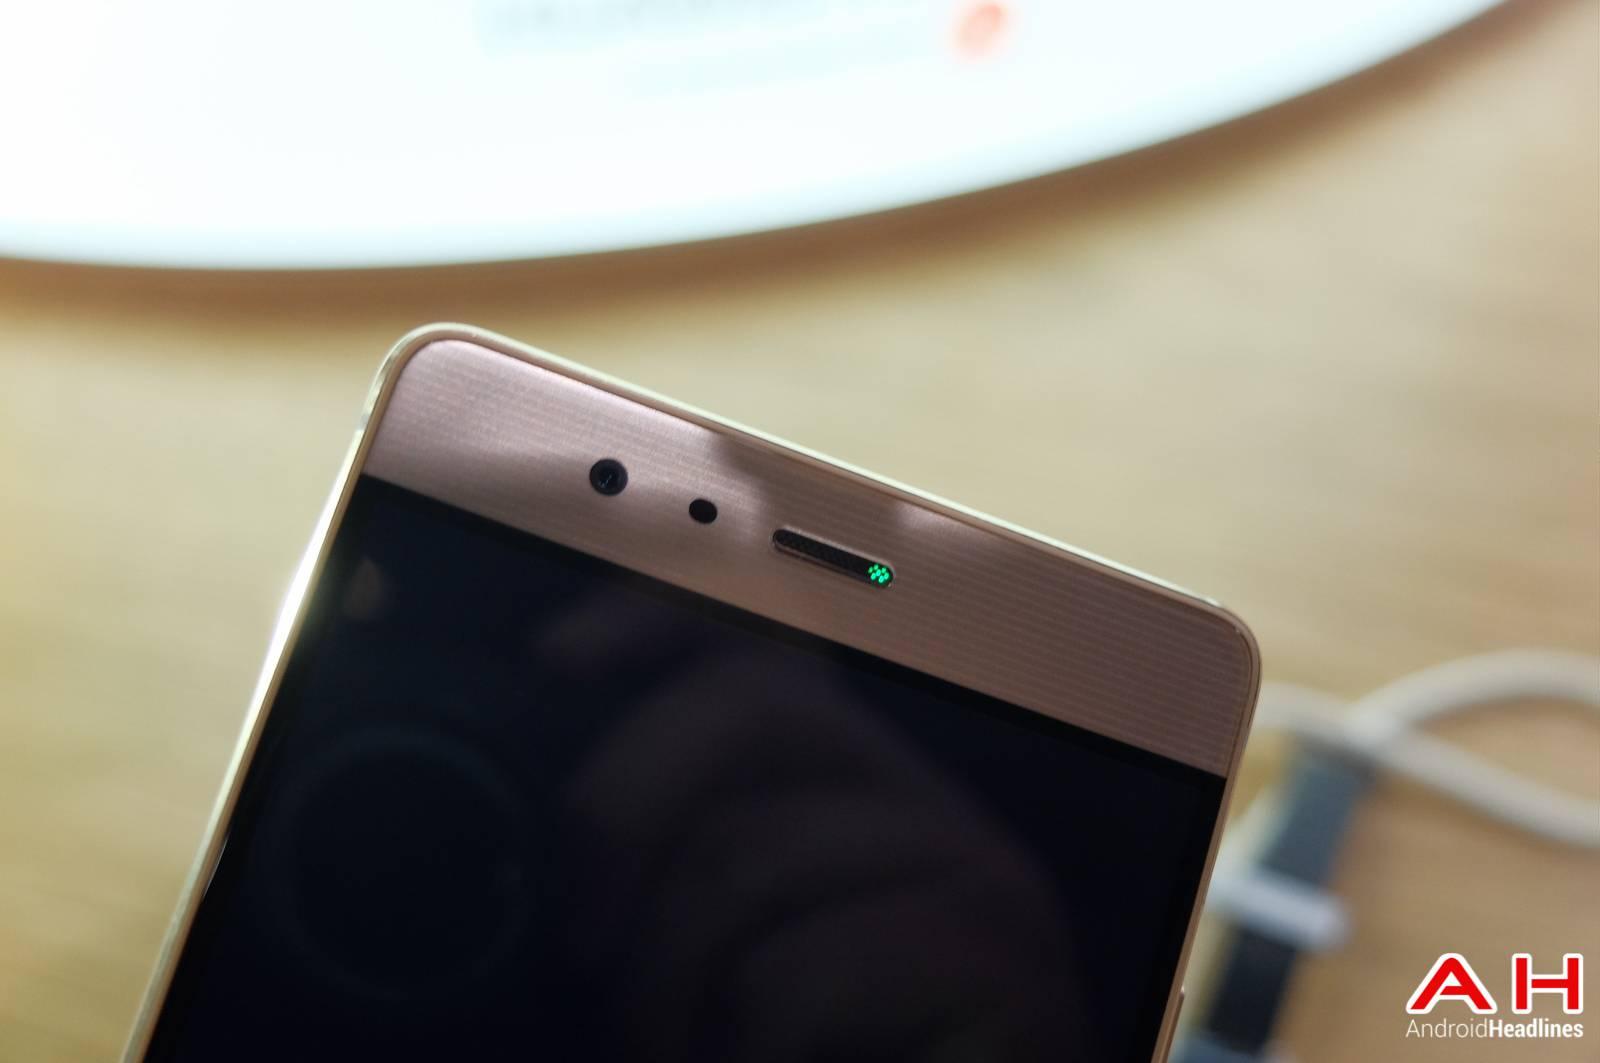 Huawei P9 Plus AH 0545